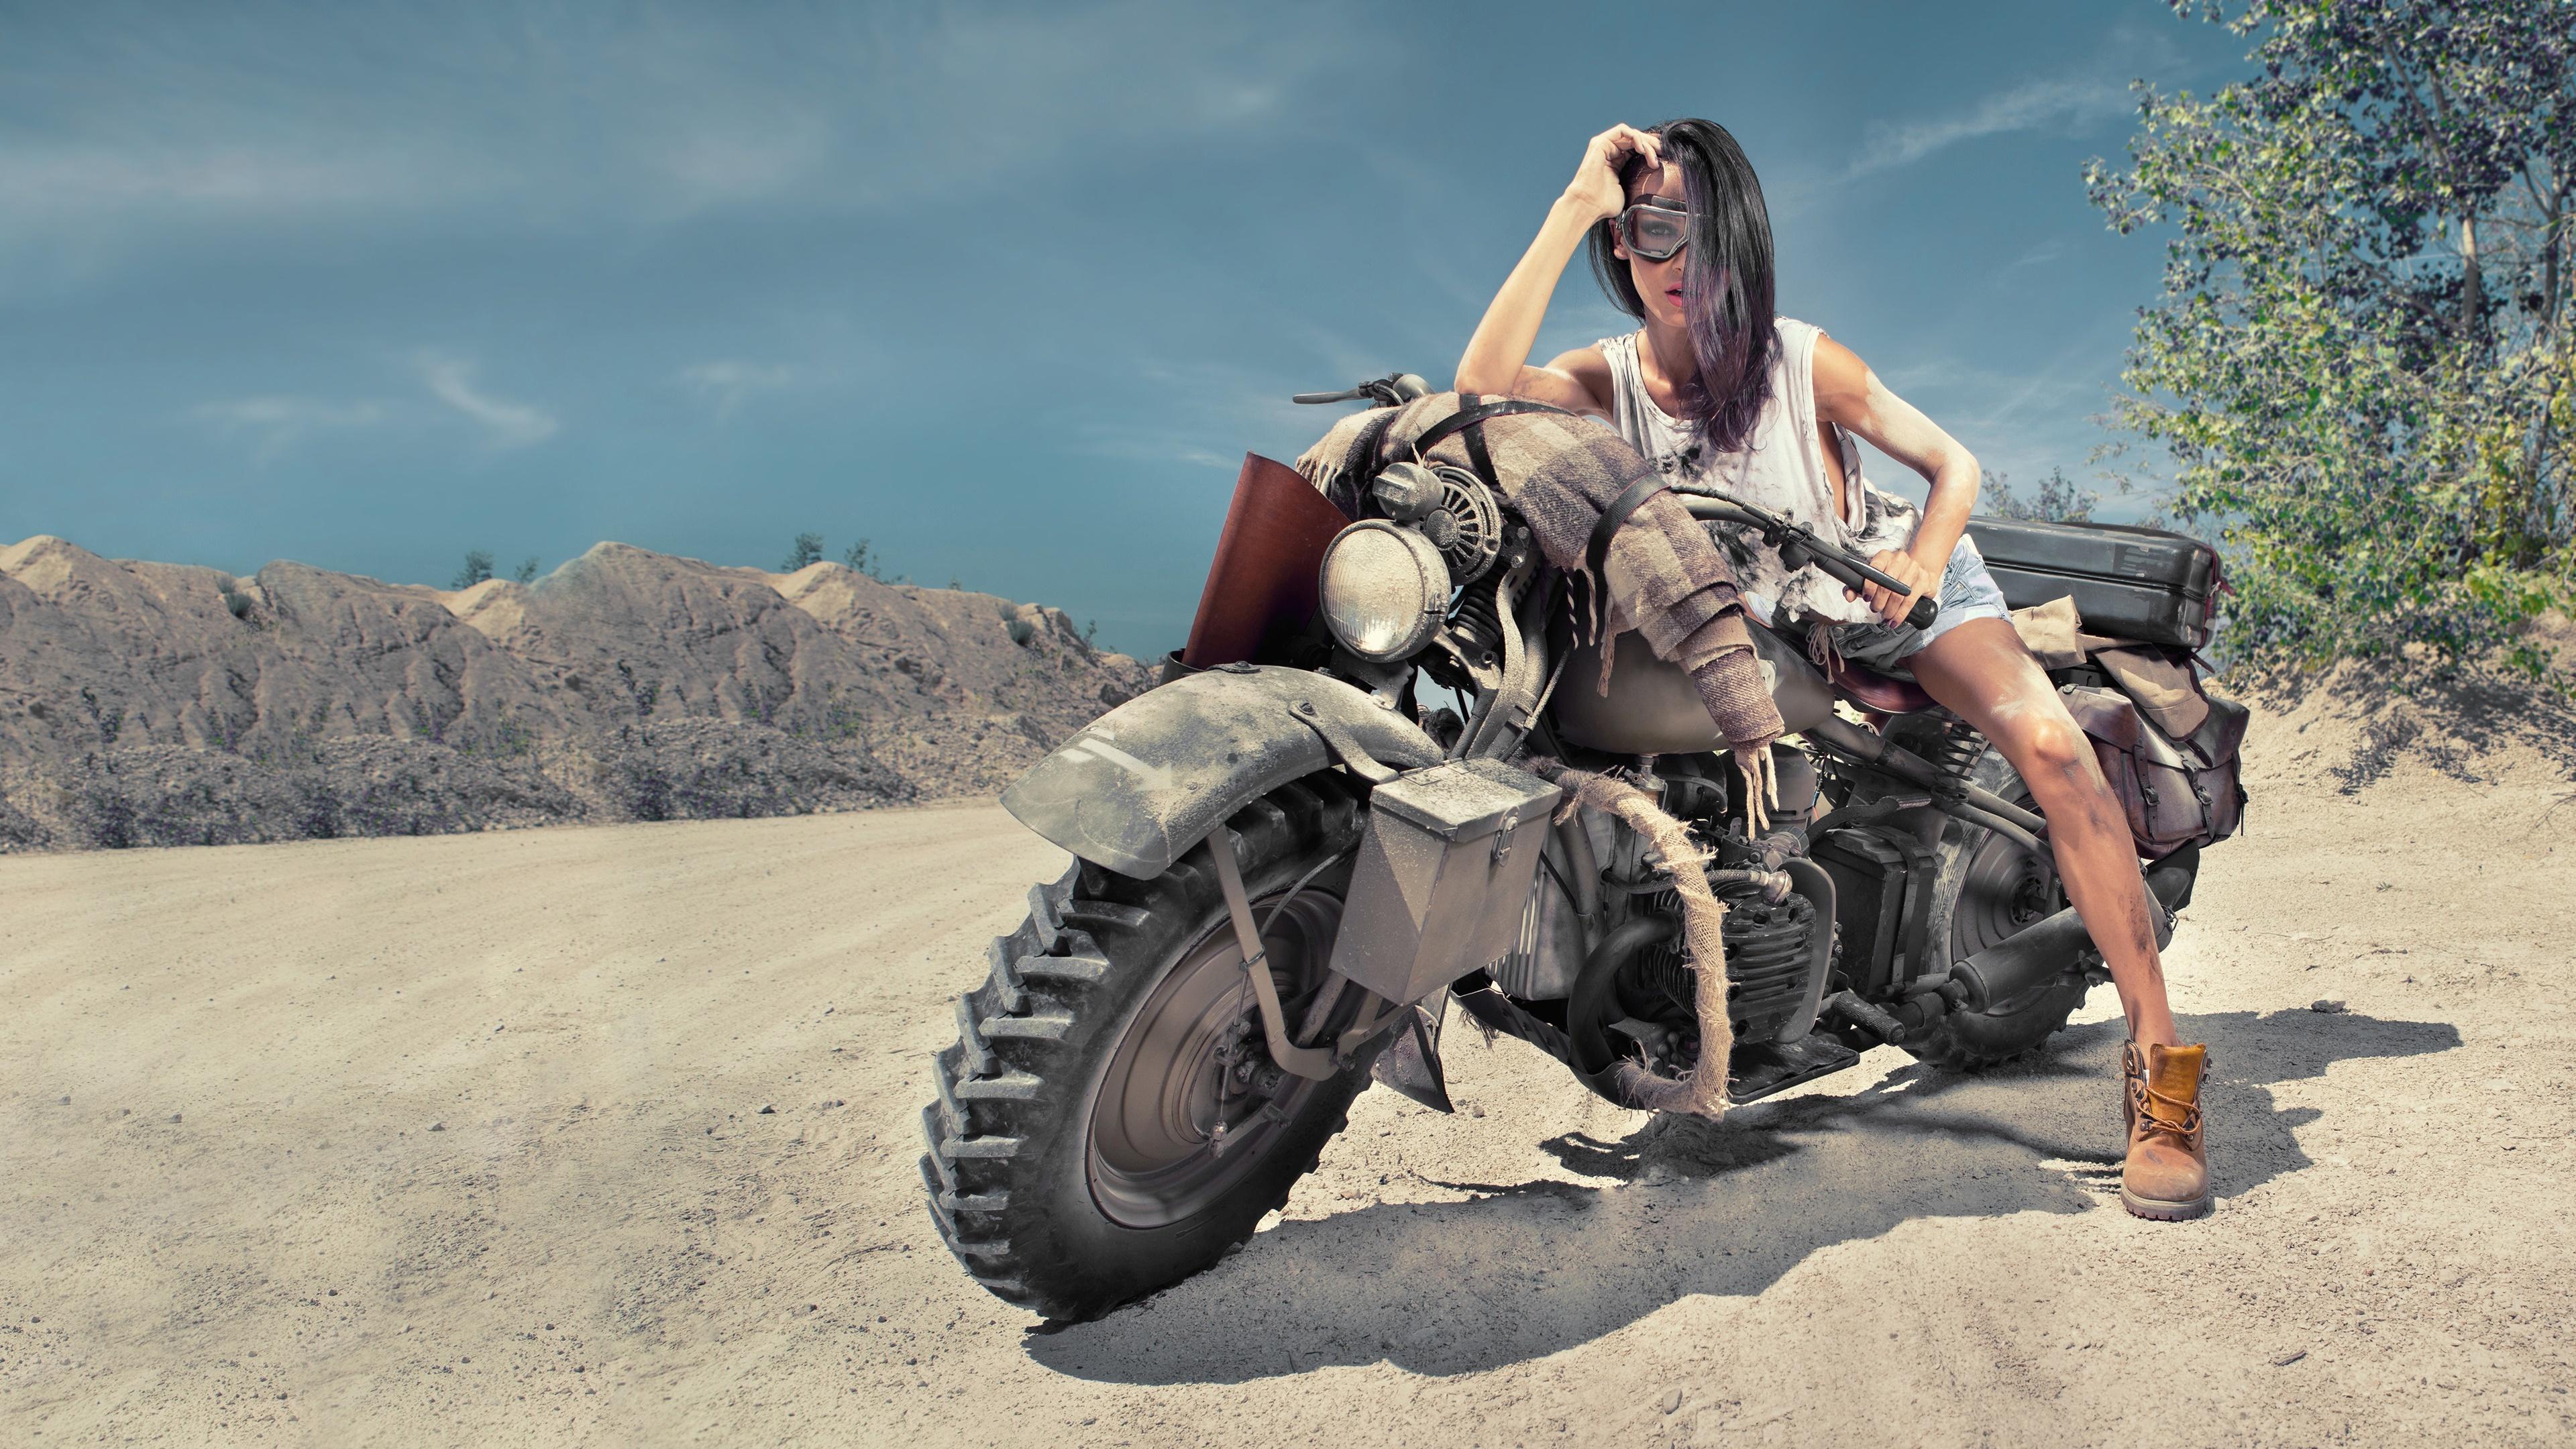 3840x2160 Girl On Desert Offroad Bike 4k Hd 4k Wallpapers